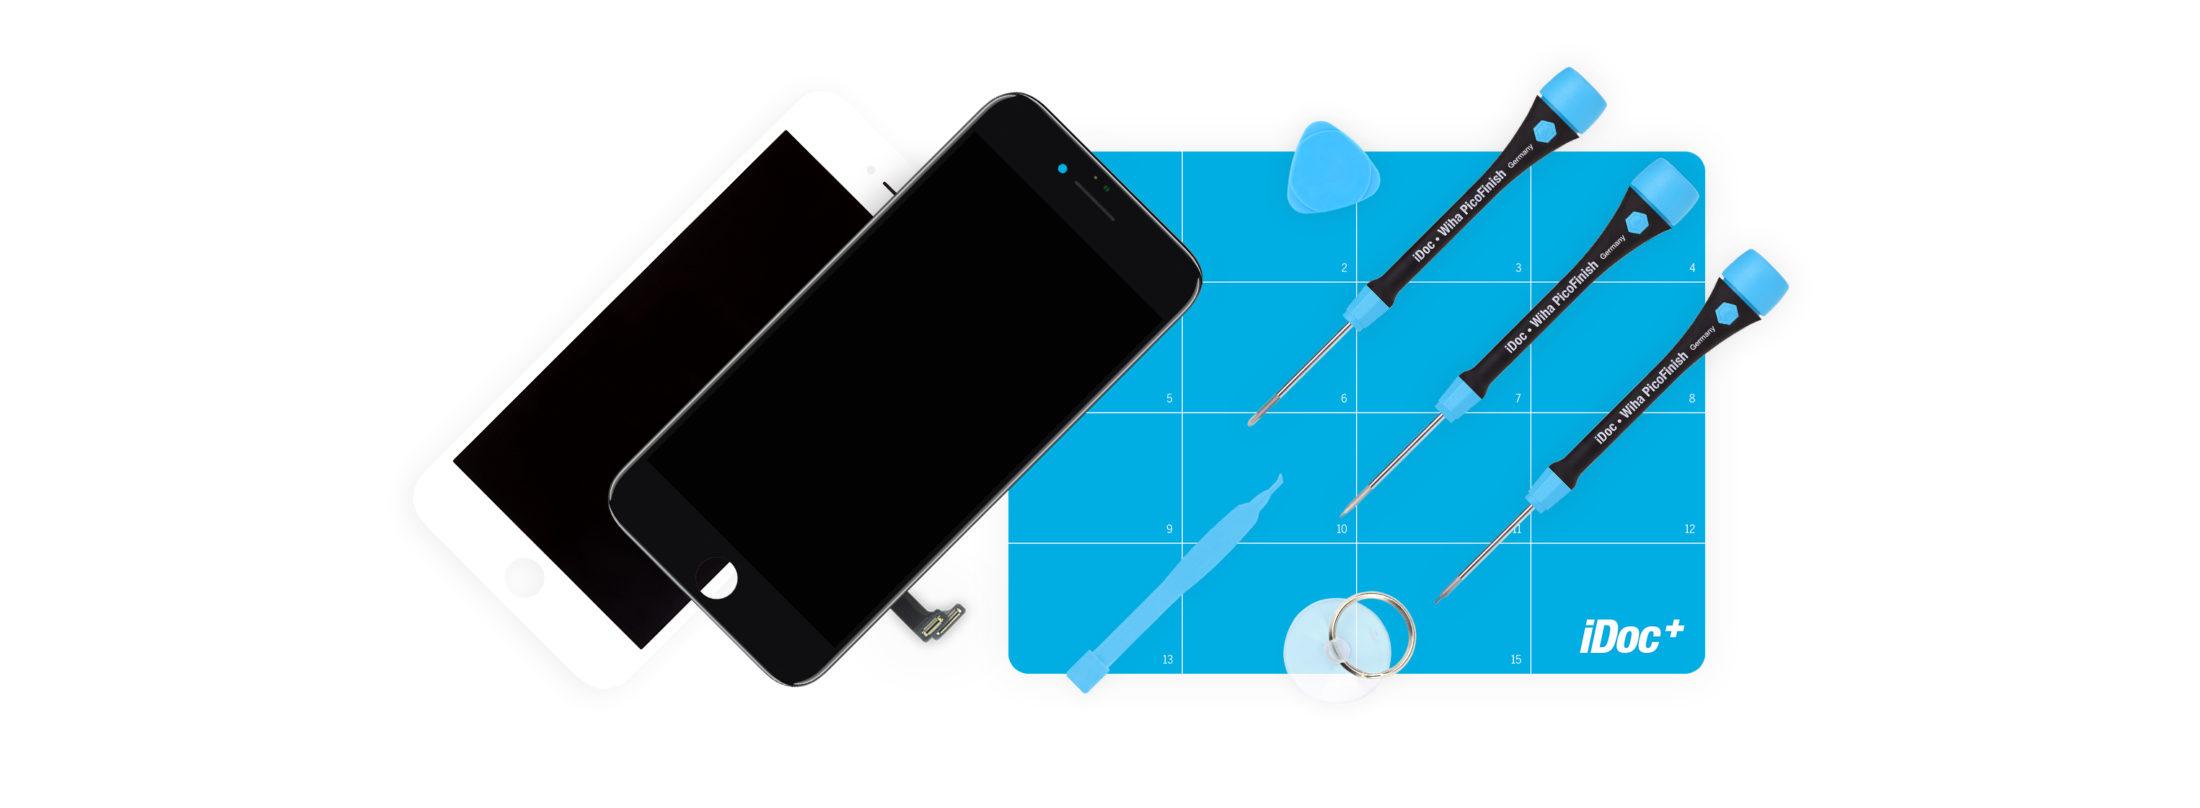 iphone schraubenzieher media markt